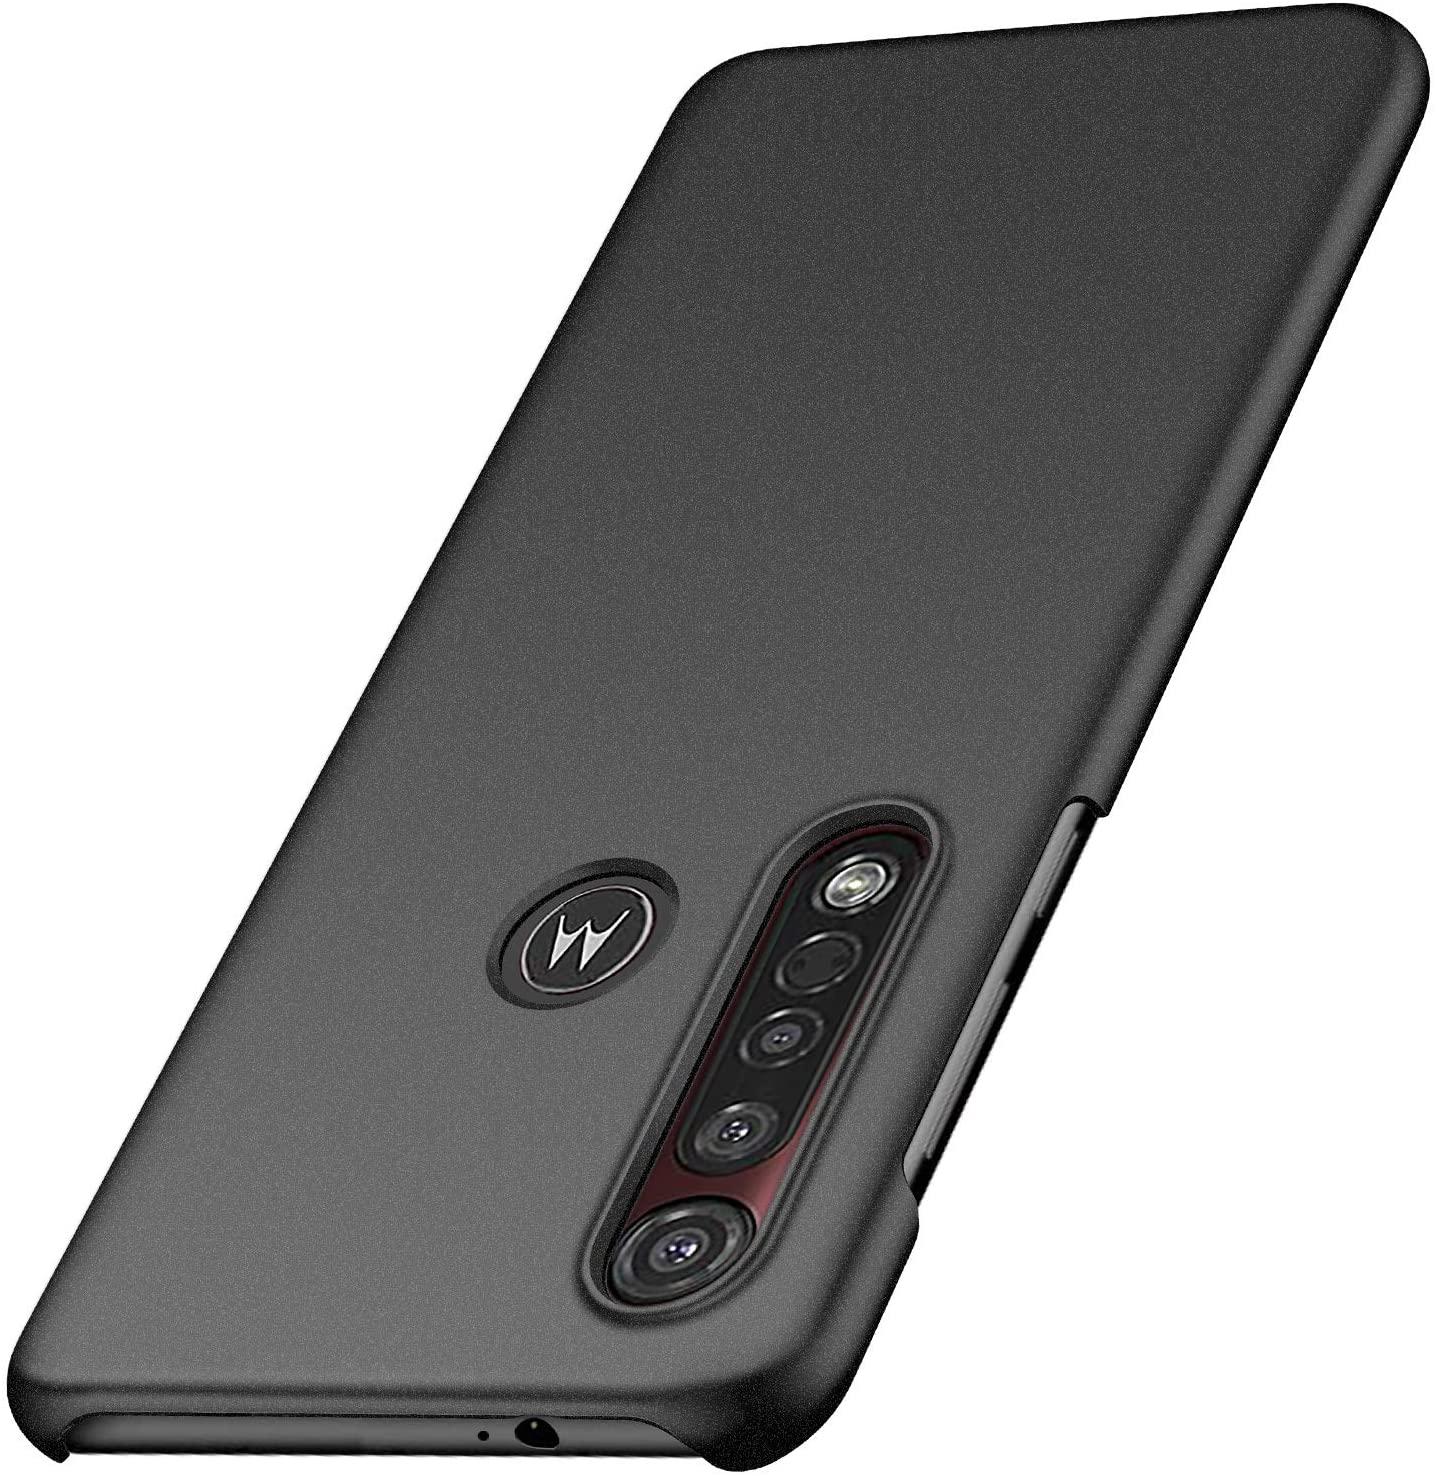 Yipmai Compatible with Motorola Moto G8 Plus Case, 0.03 Inch Ultra Thin Ultra Slim Hard PC Plastic Protective Case for Motorola Moto G8 Plus (Matte Black)